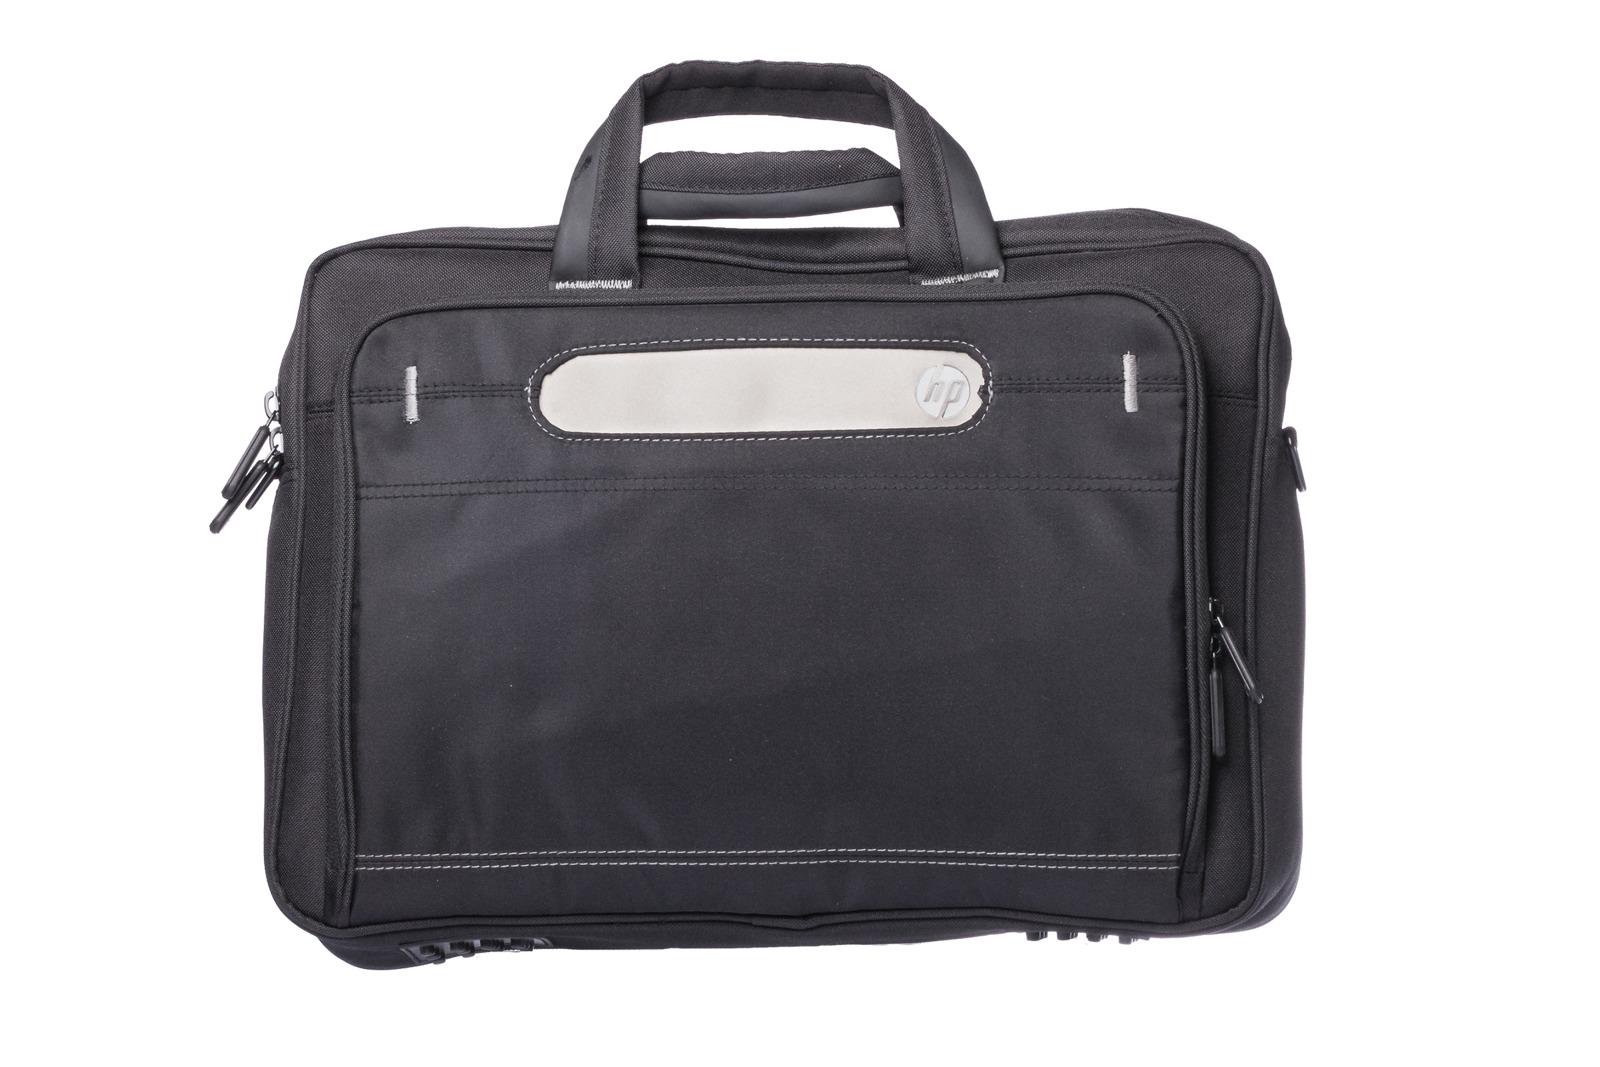 Laptoptasche HP Business Slim Top Load Case 15.6 717272-001